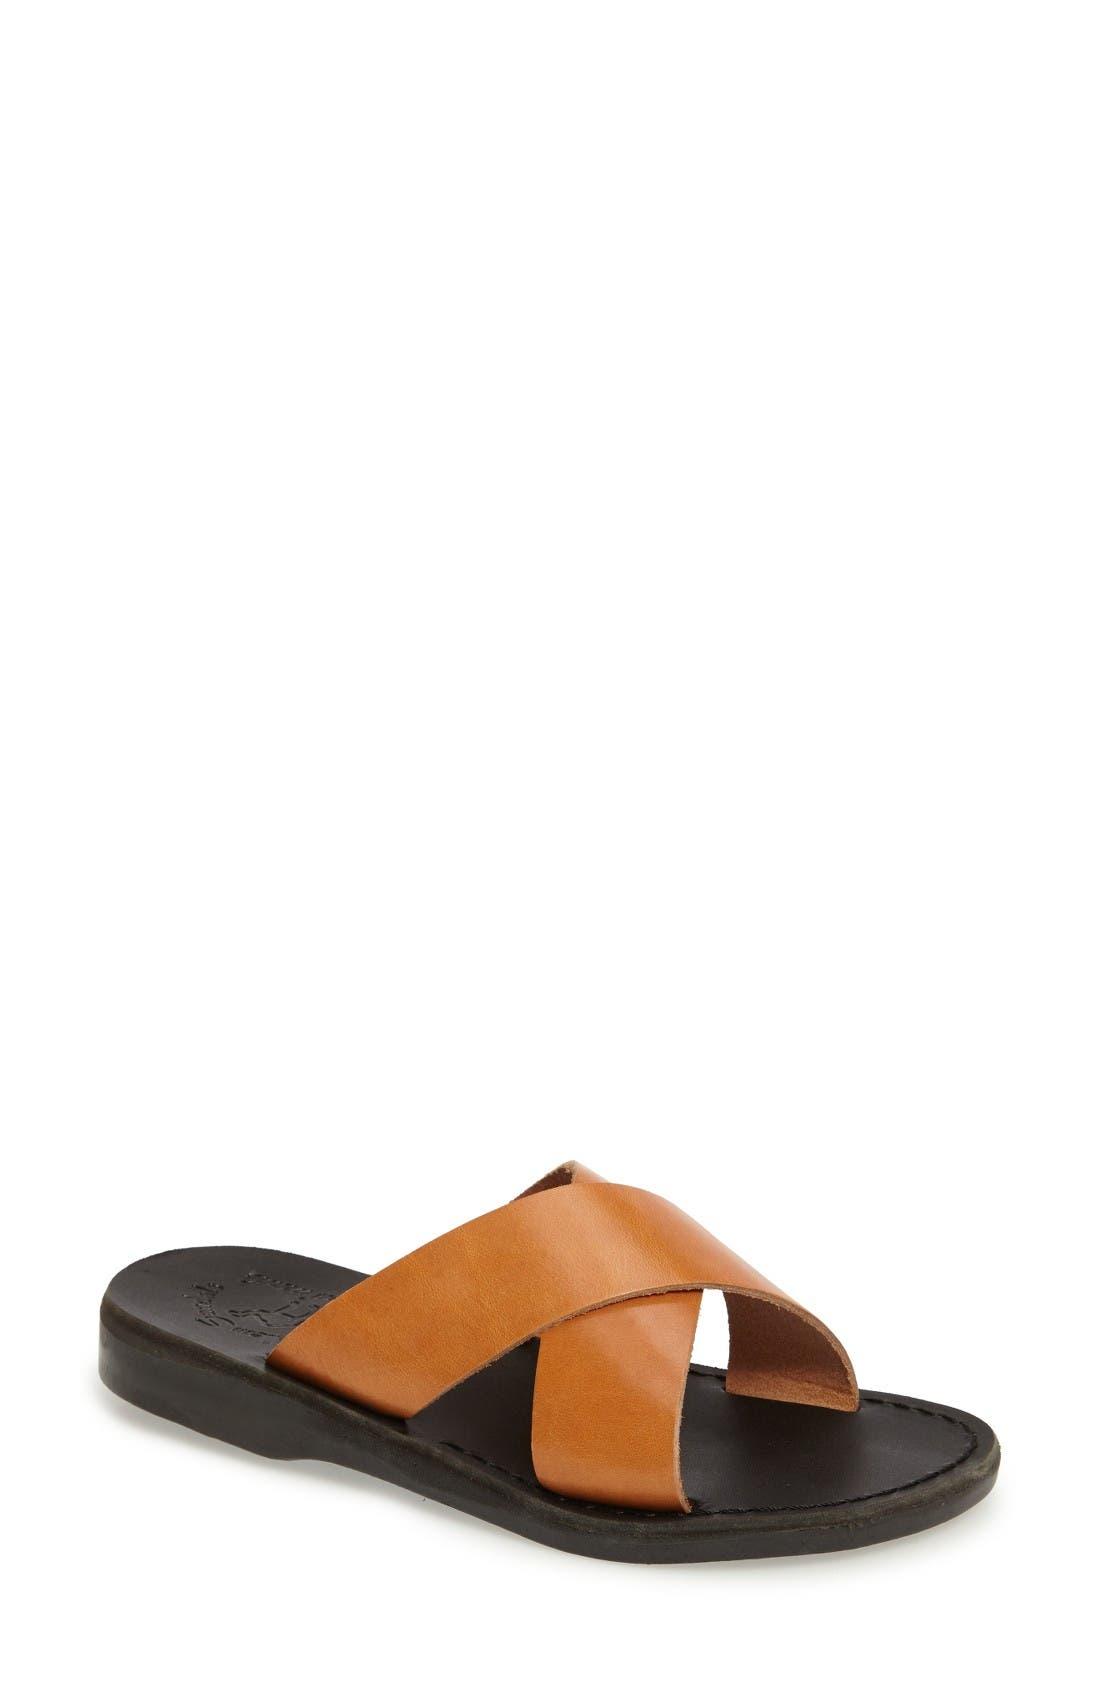 Elan Crisscross Sandal,                         Main,                         color, Brown/ Tan Leather